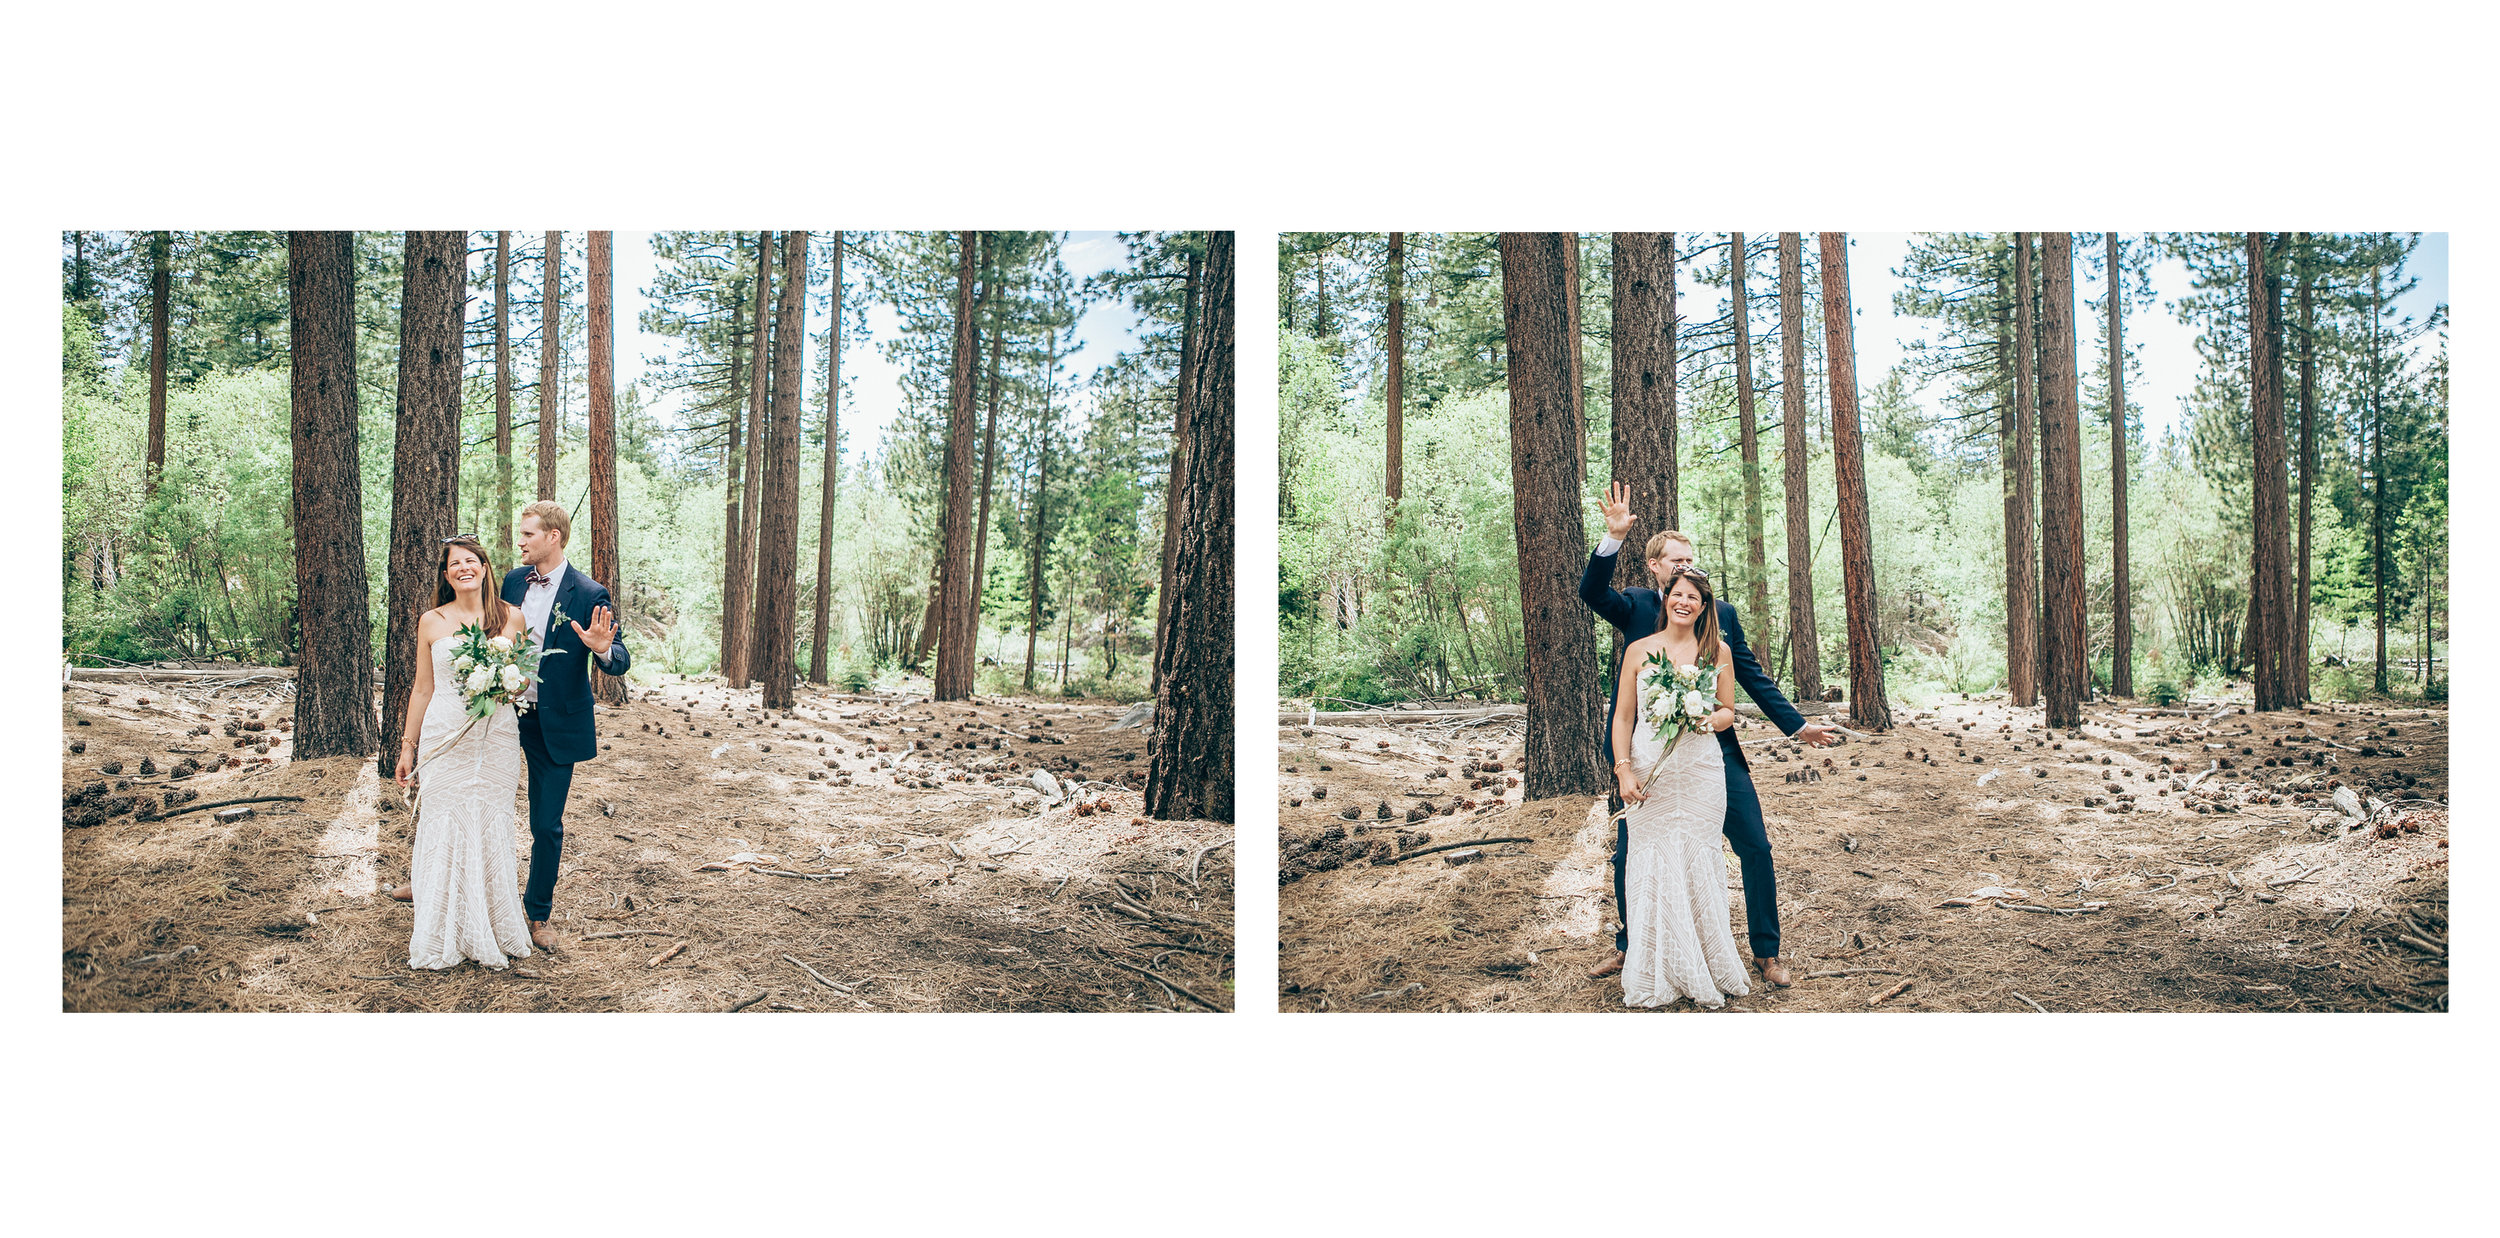 Melisa&David_Wedding_Day_027.jpg